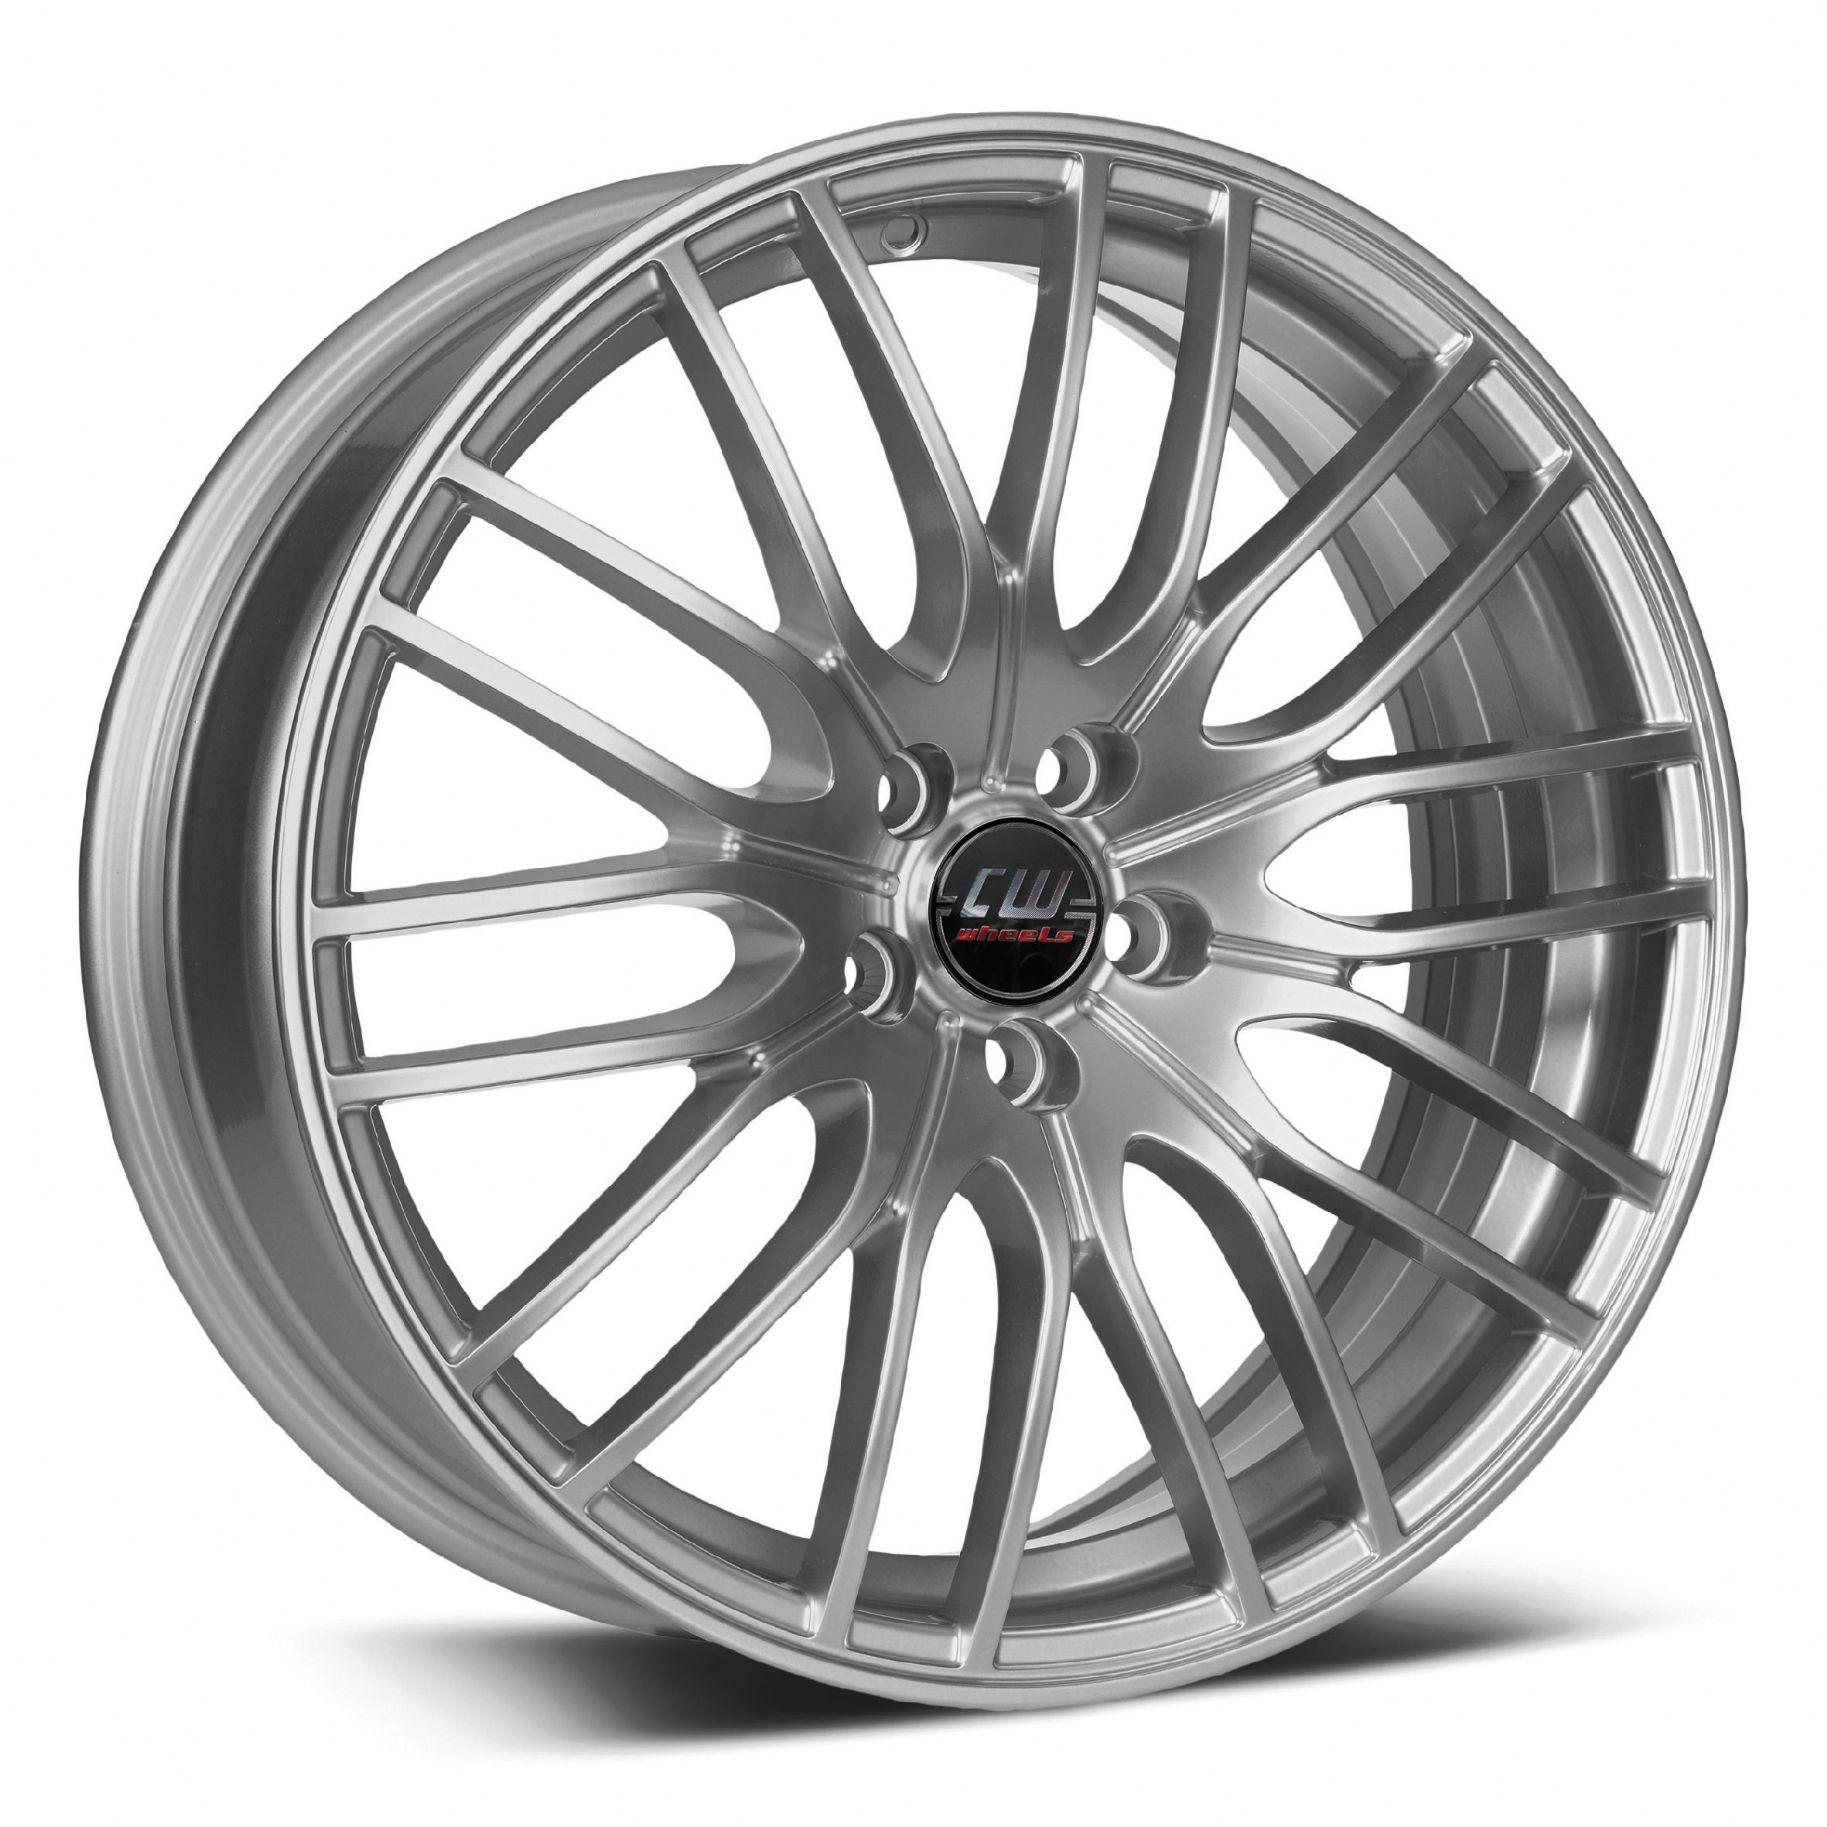 Литой Borbet CW4 R17/7 PCD5*114,3 ET40 DIA72.5 Brilliant Silver